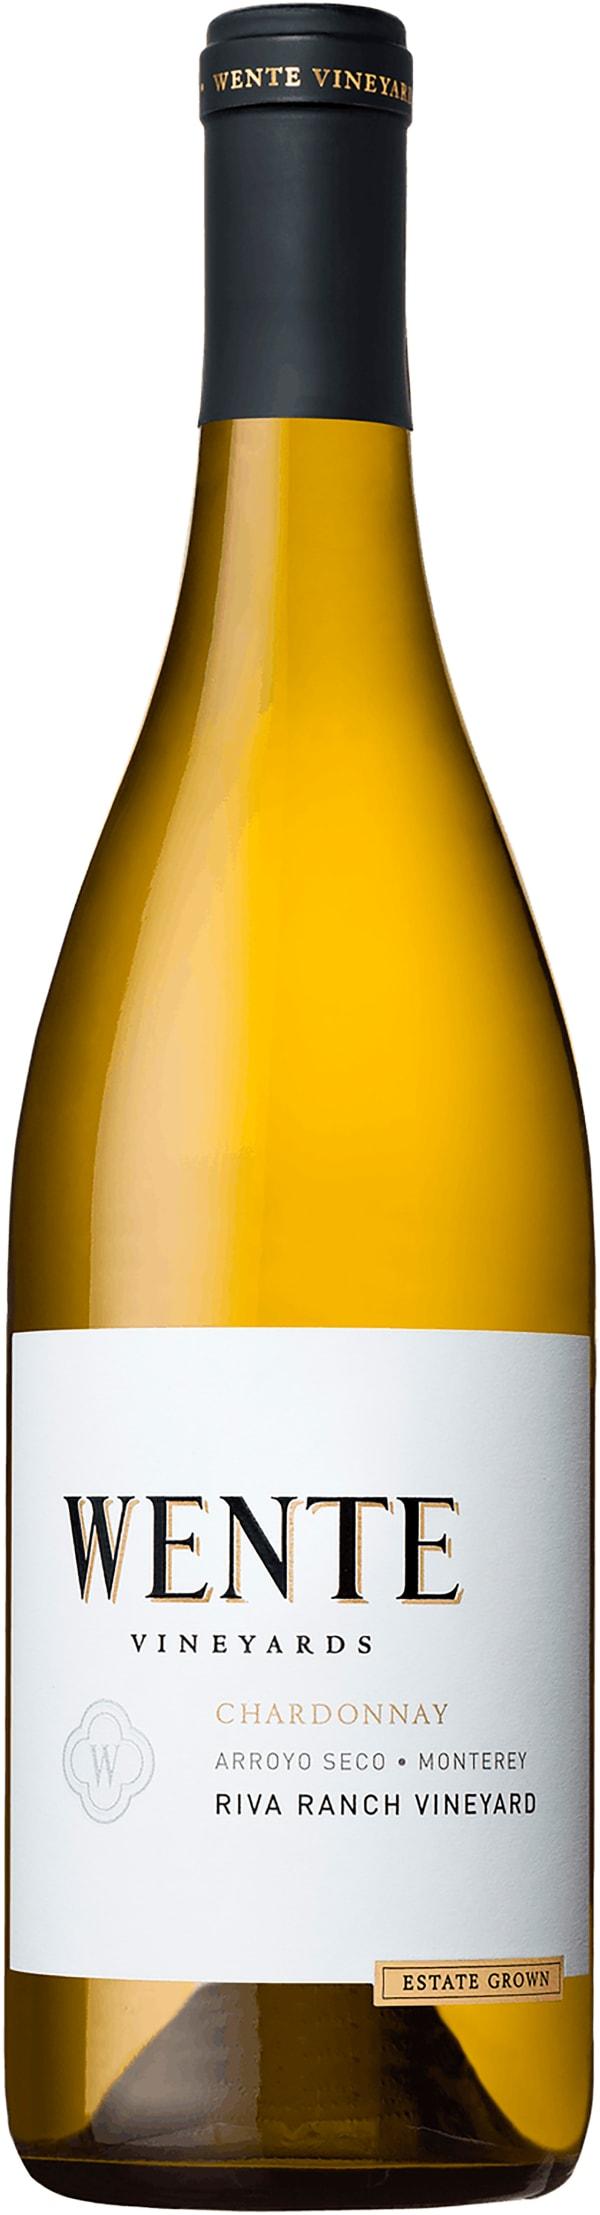 Wente Riva Ranch Chardonnay 2018